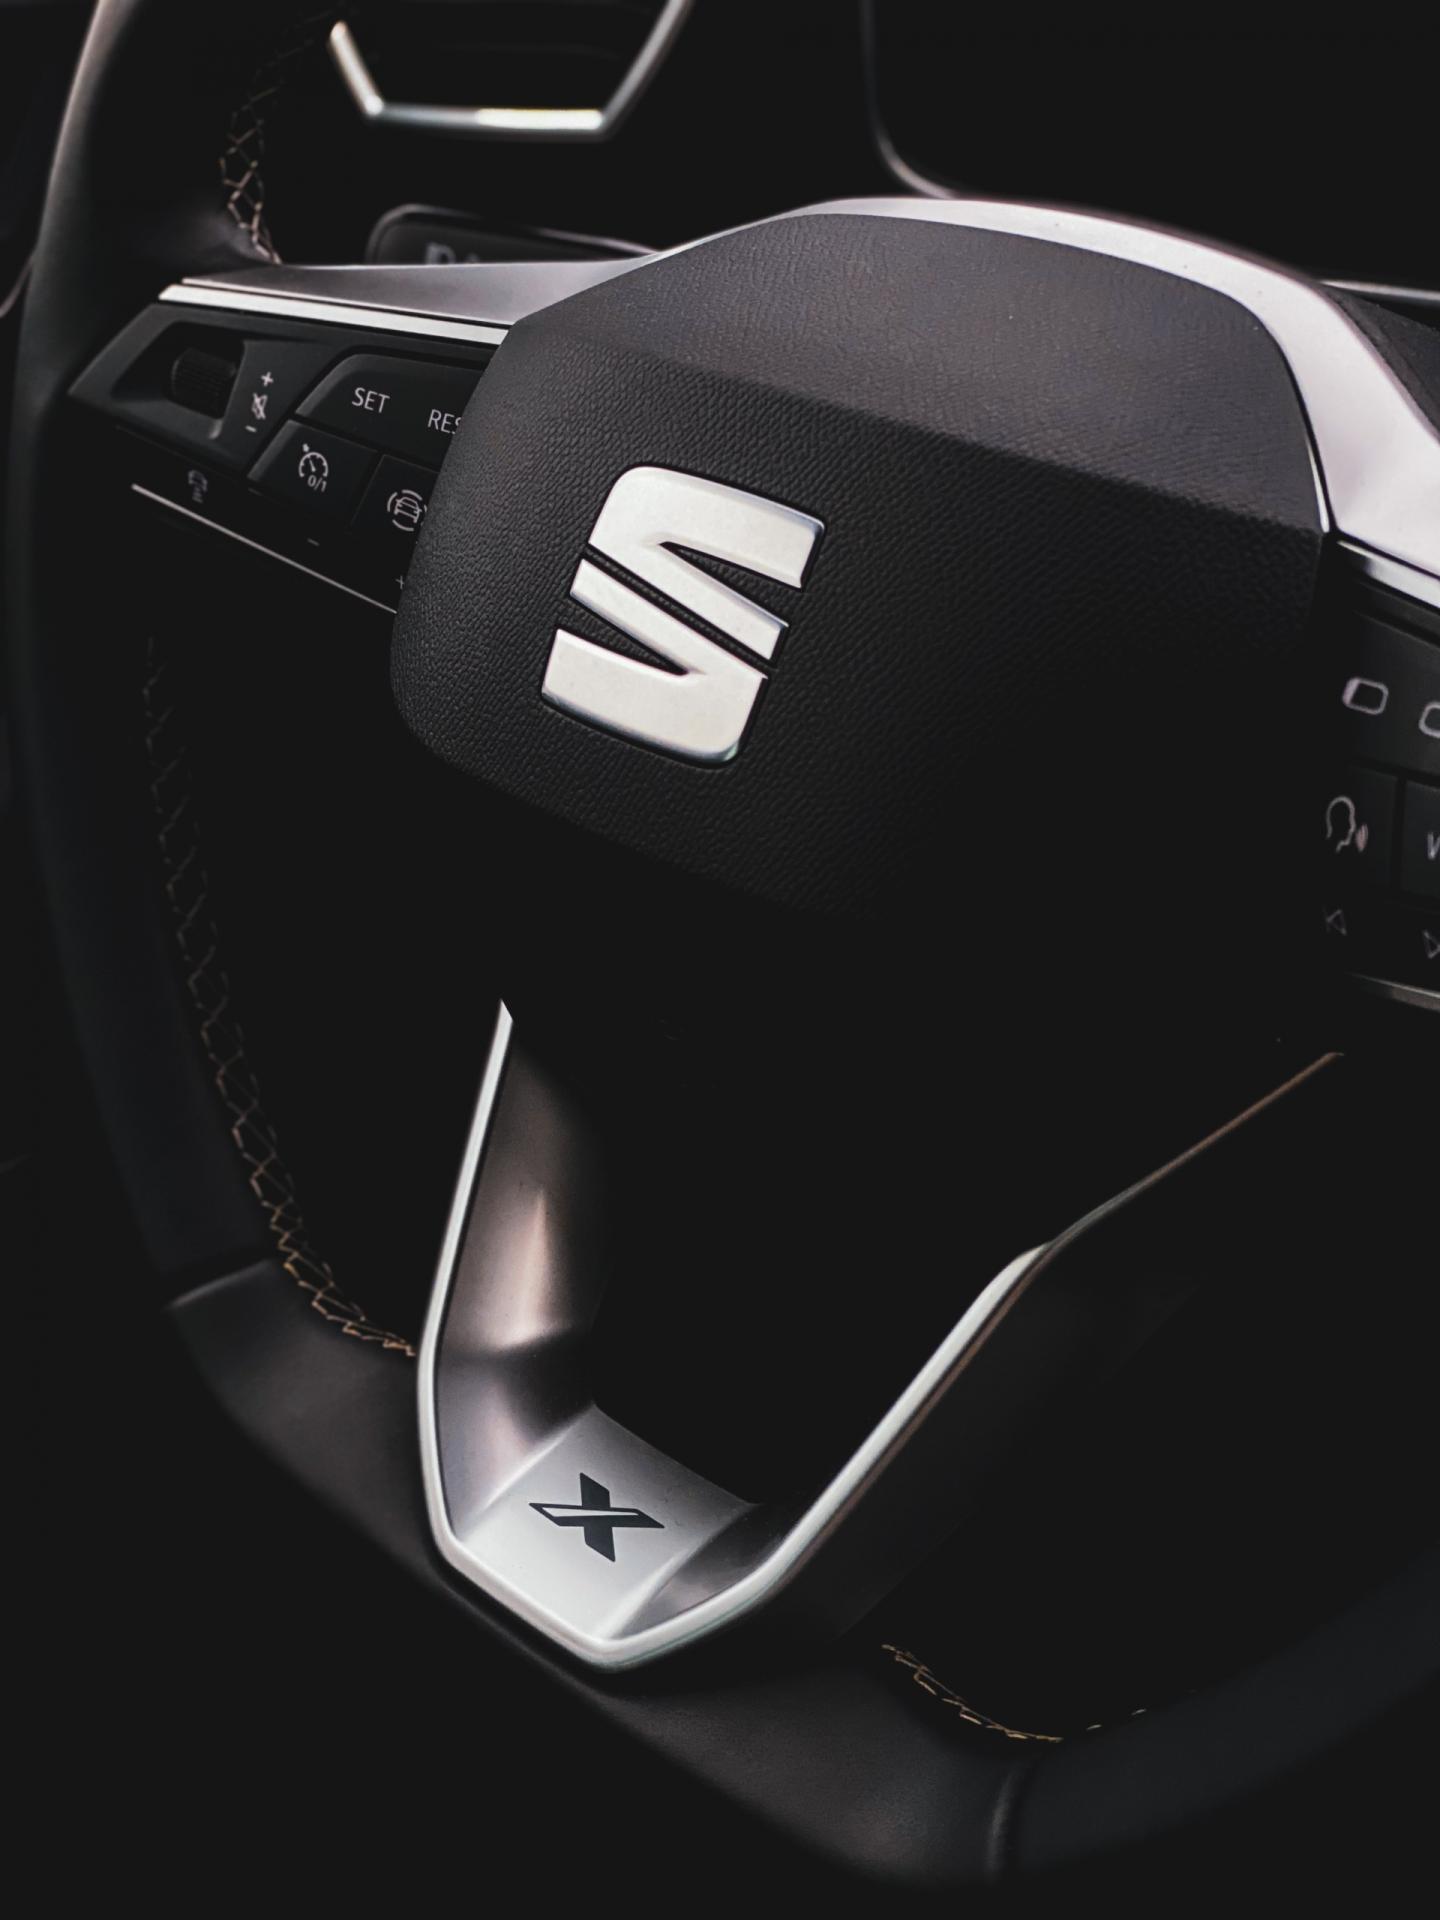 Seat Leon steering wheel detail